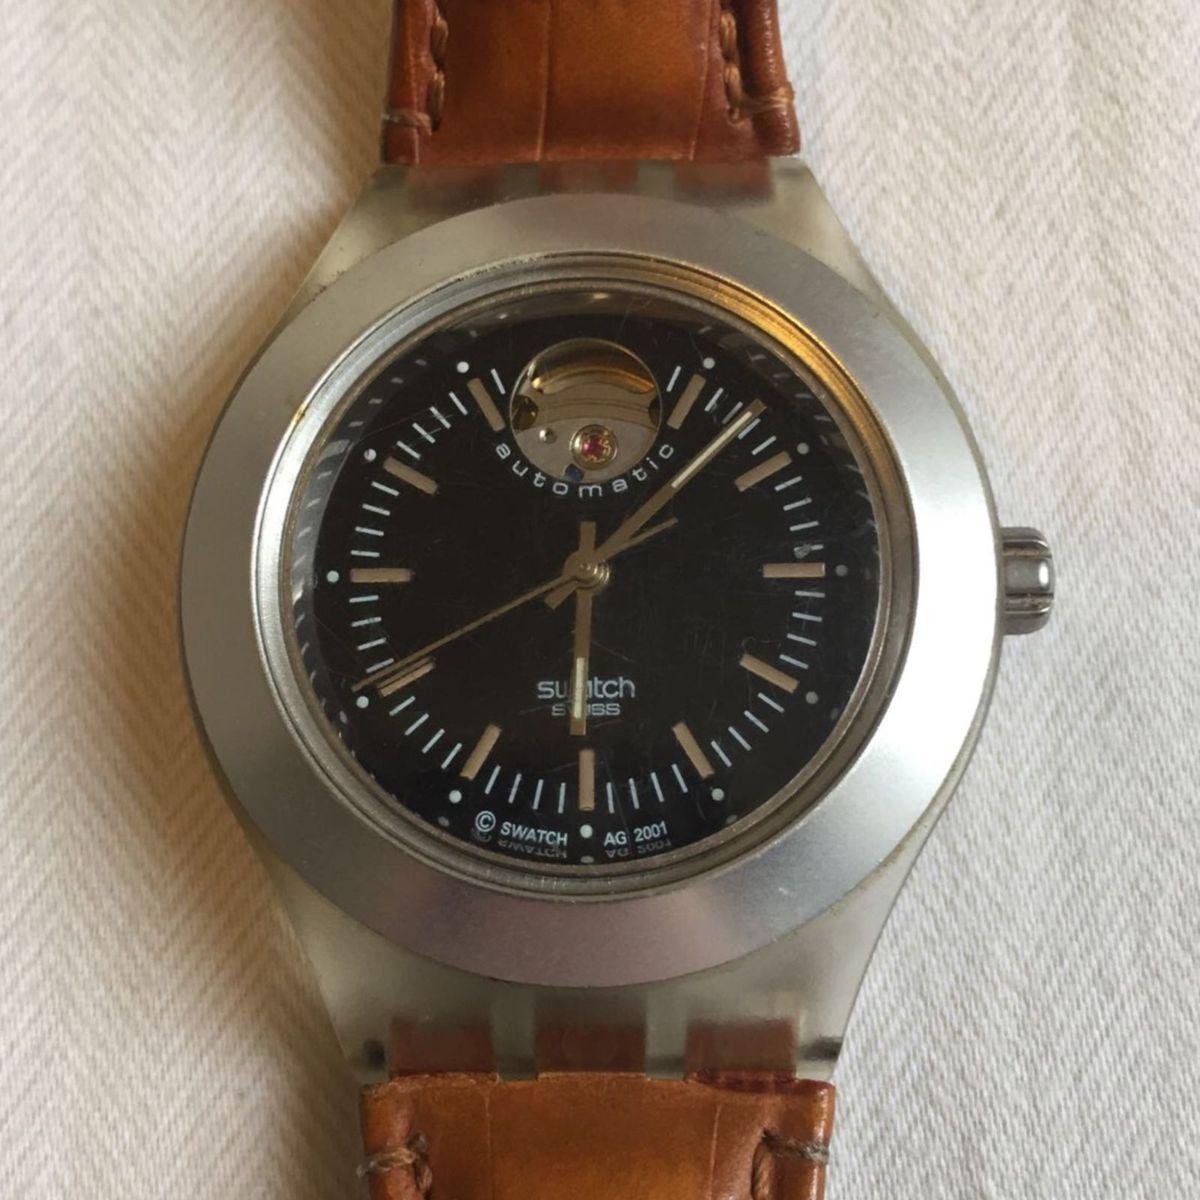 ef8f9a8a87e Relógio Swatch Irony Automático